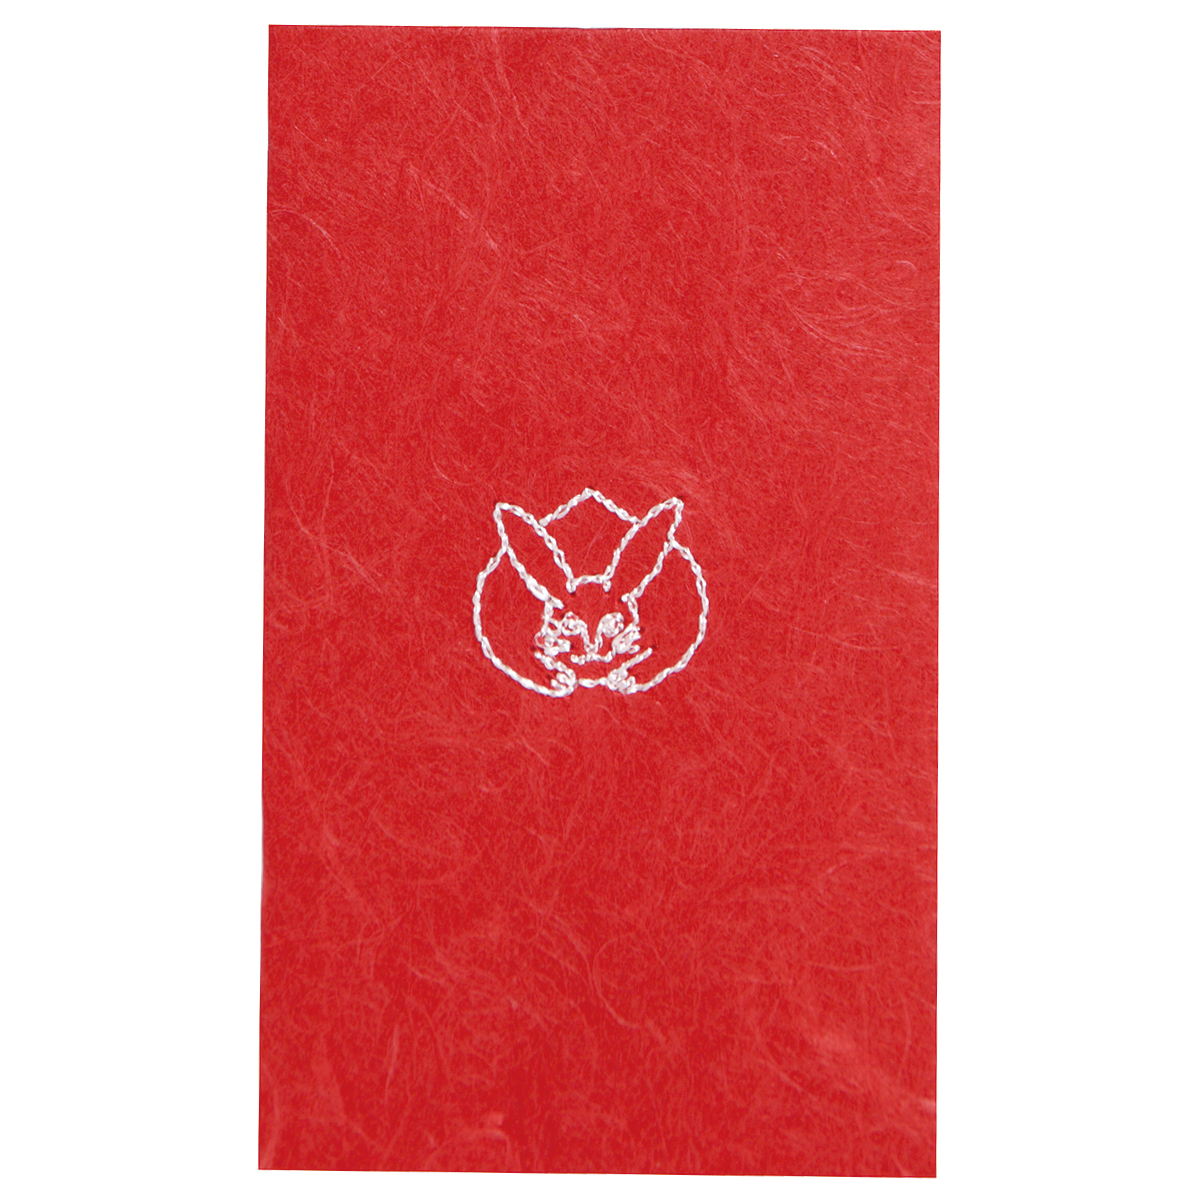 KY46-46/ぽち袋/兎〈赤〉/【ゆうパケット可】